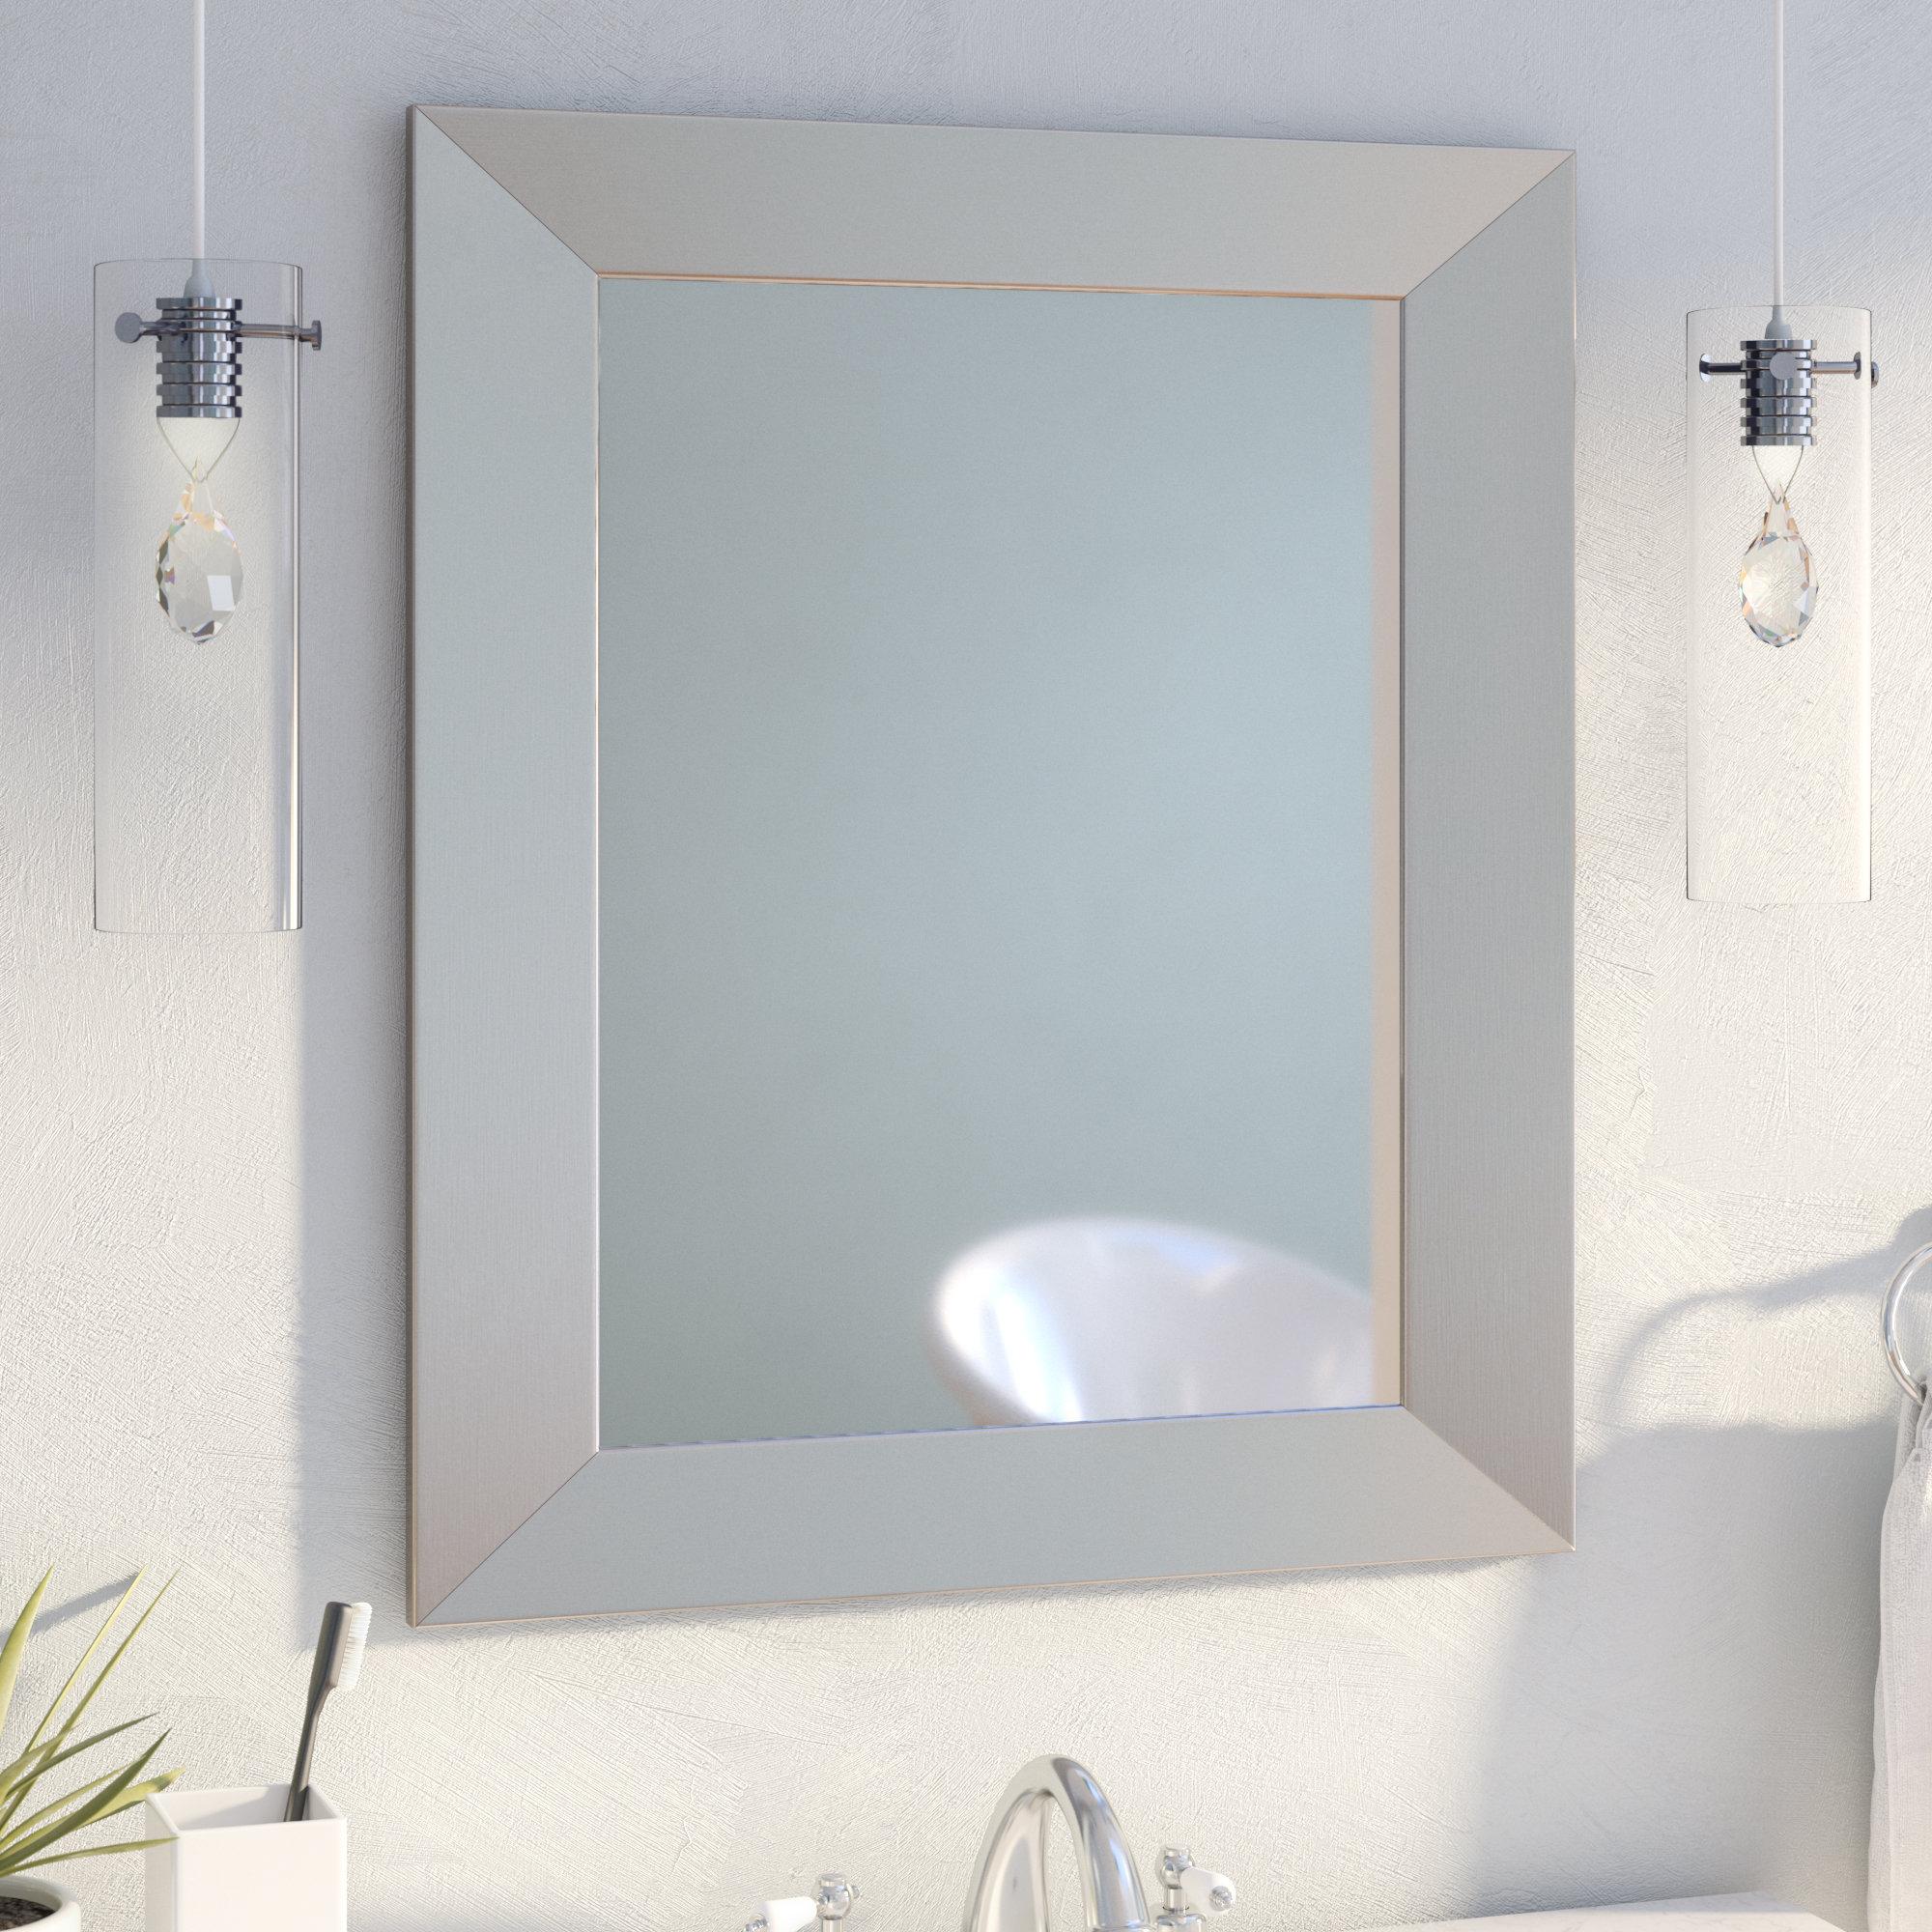 35 Inch Round Mirror | Wayfair Pertaining To Lidya Frameless Beveled Wall Mirrors (View 9 of 20)